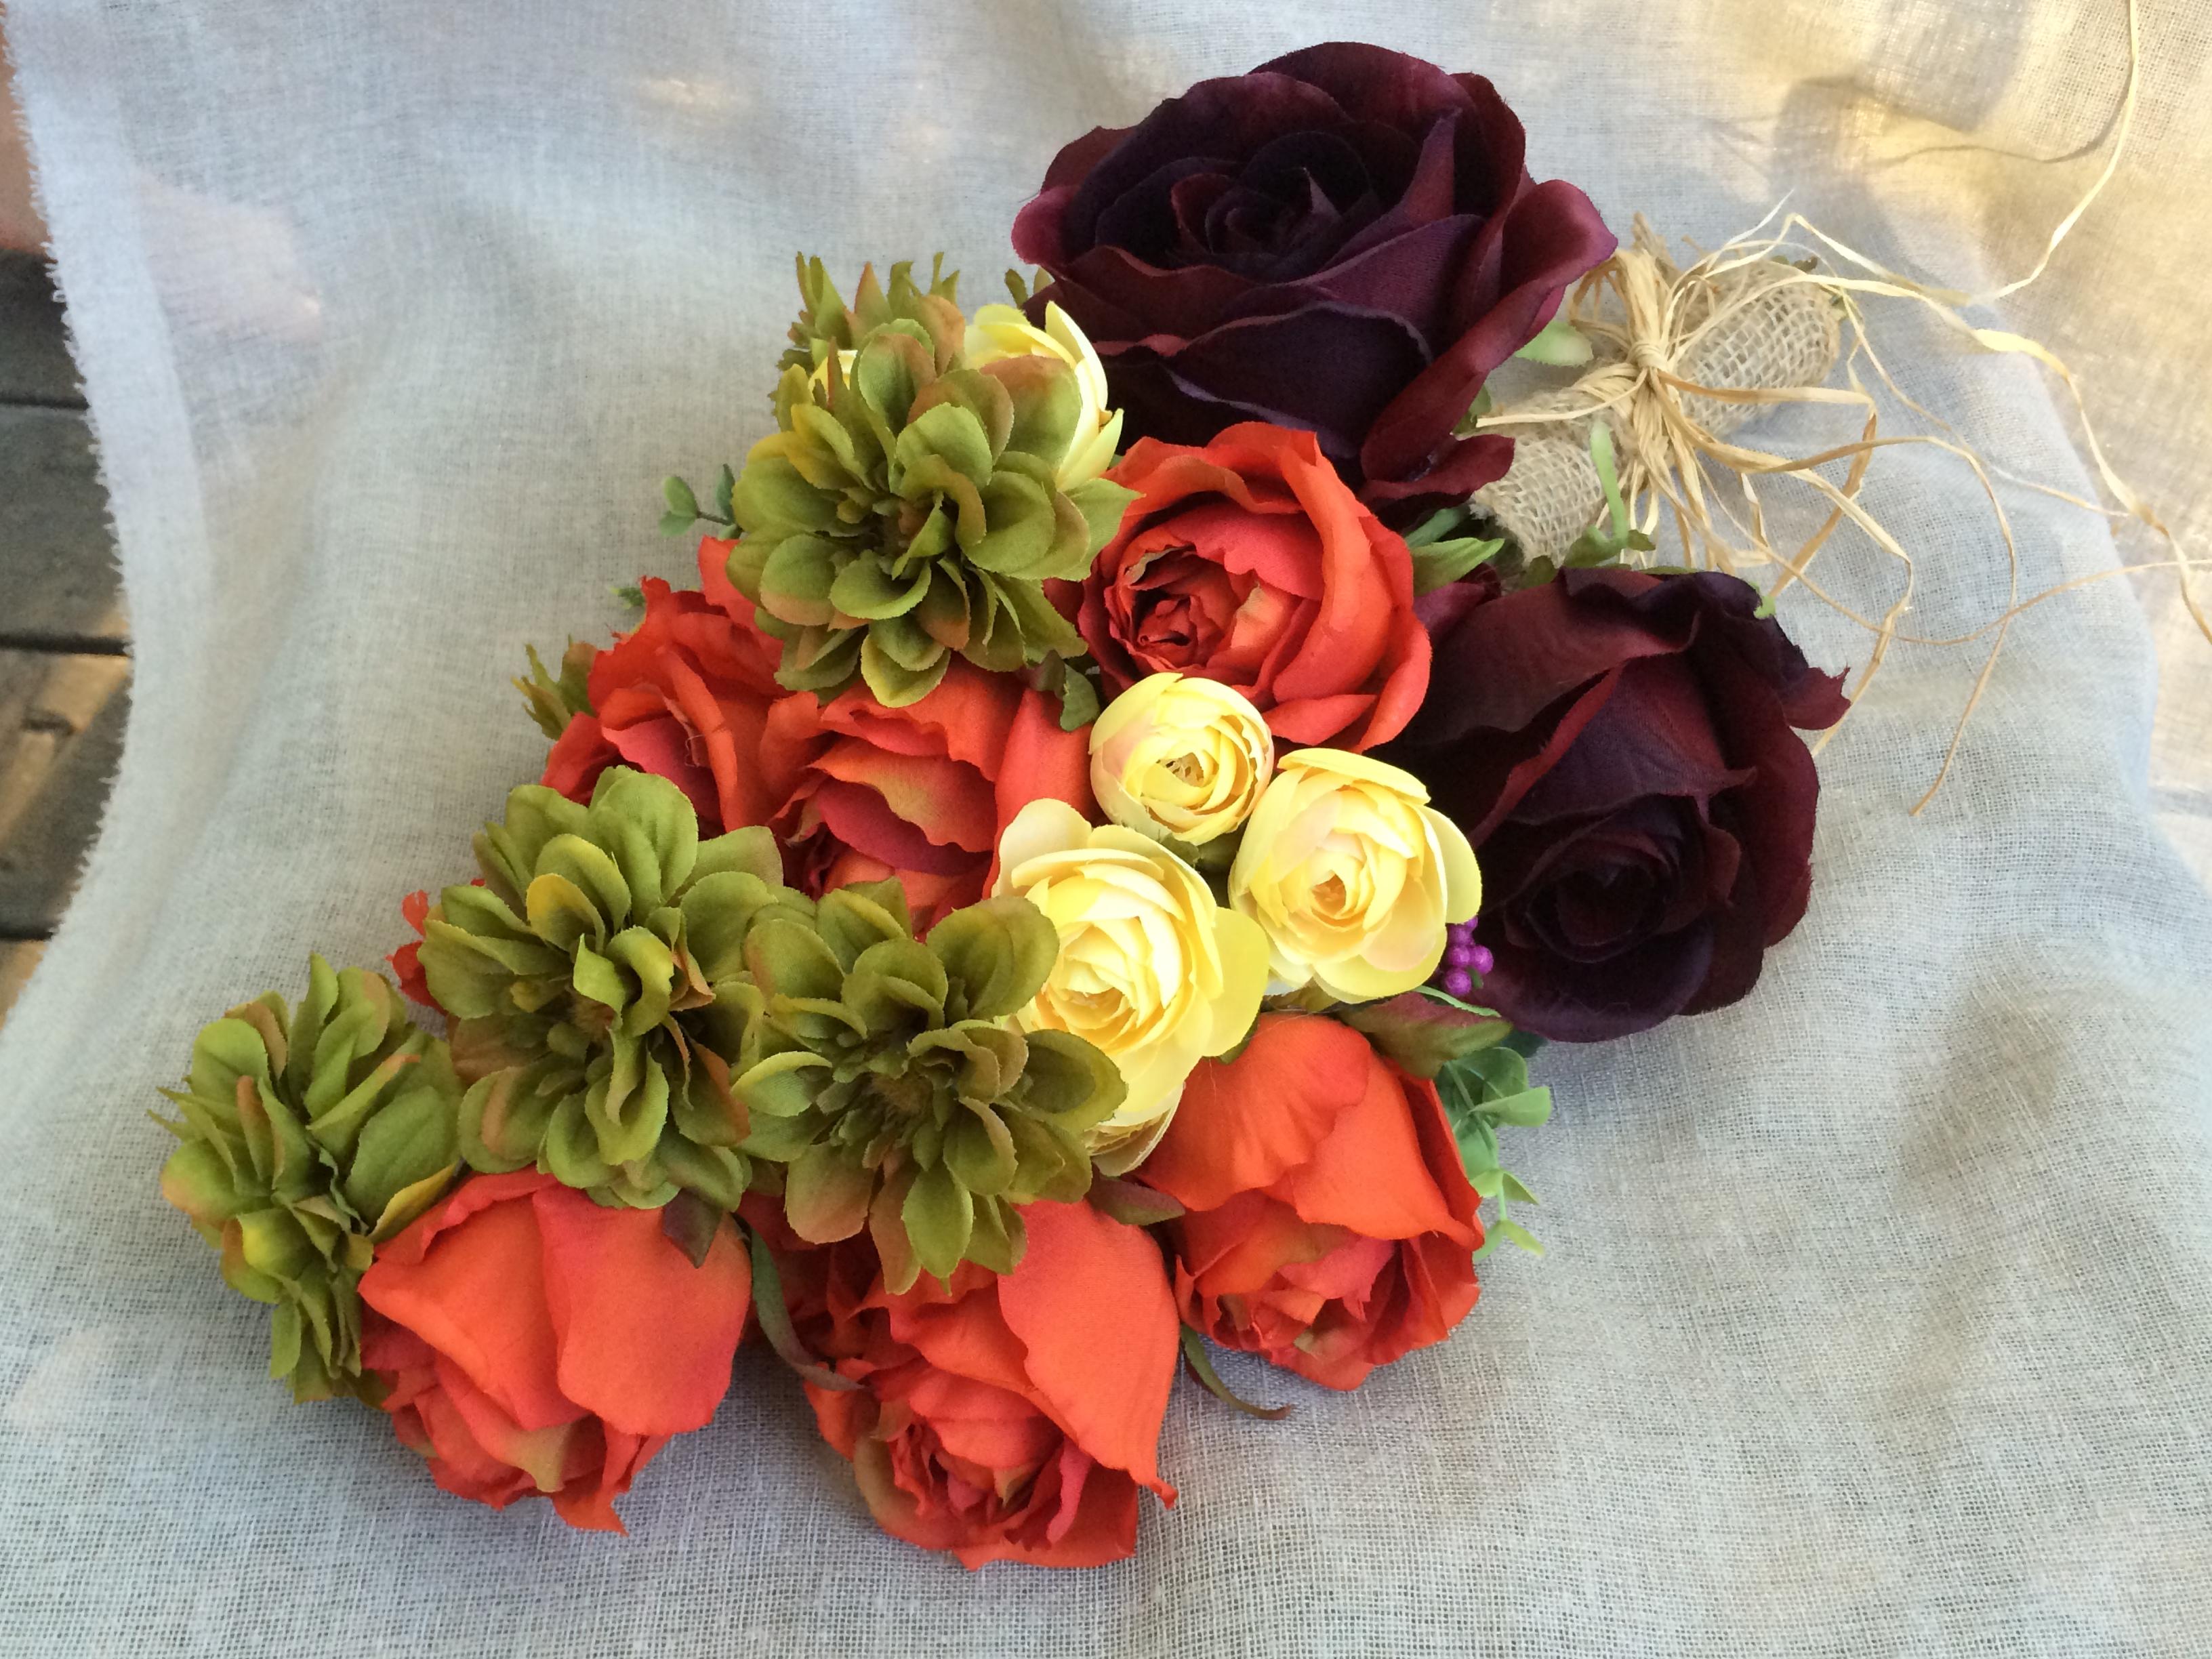 Rustic Burgundy Bridal Bouquet